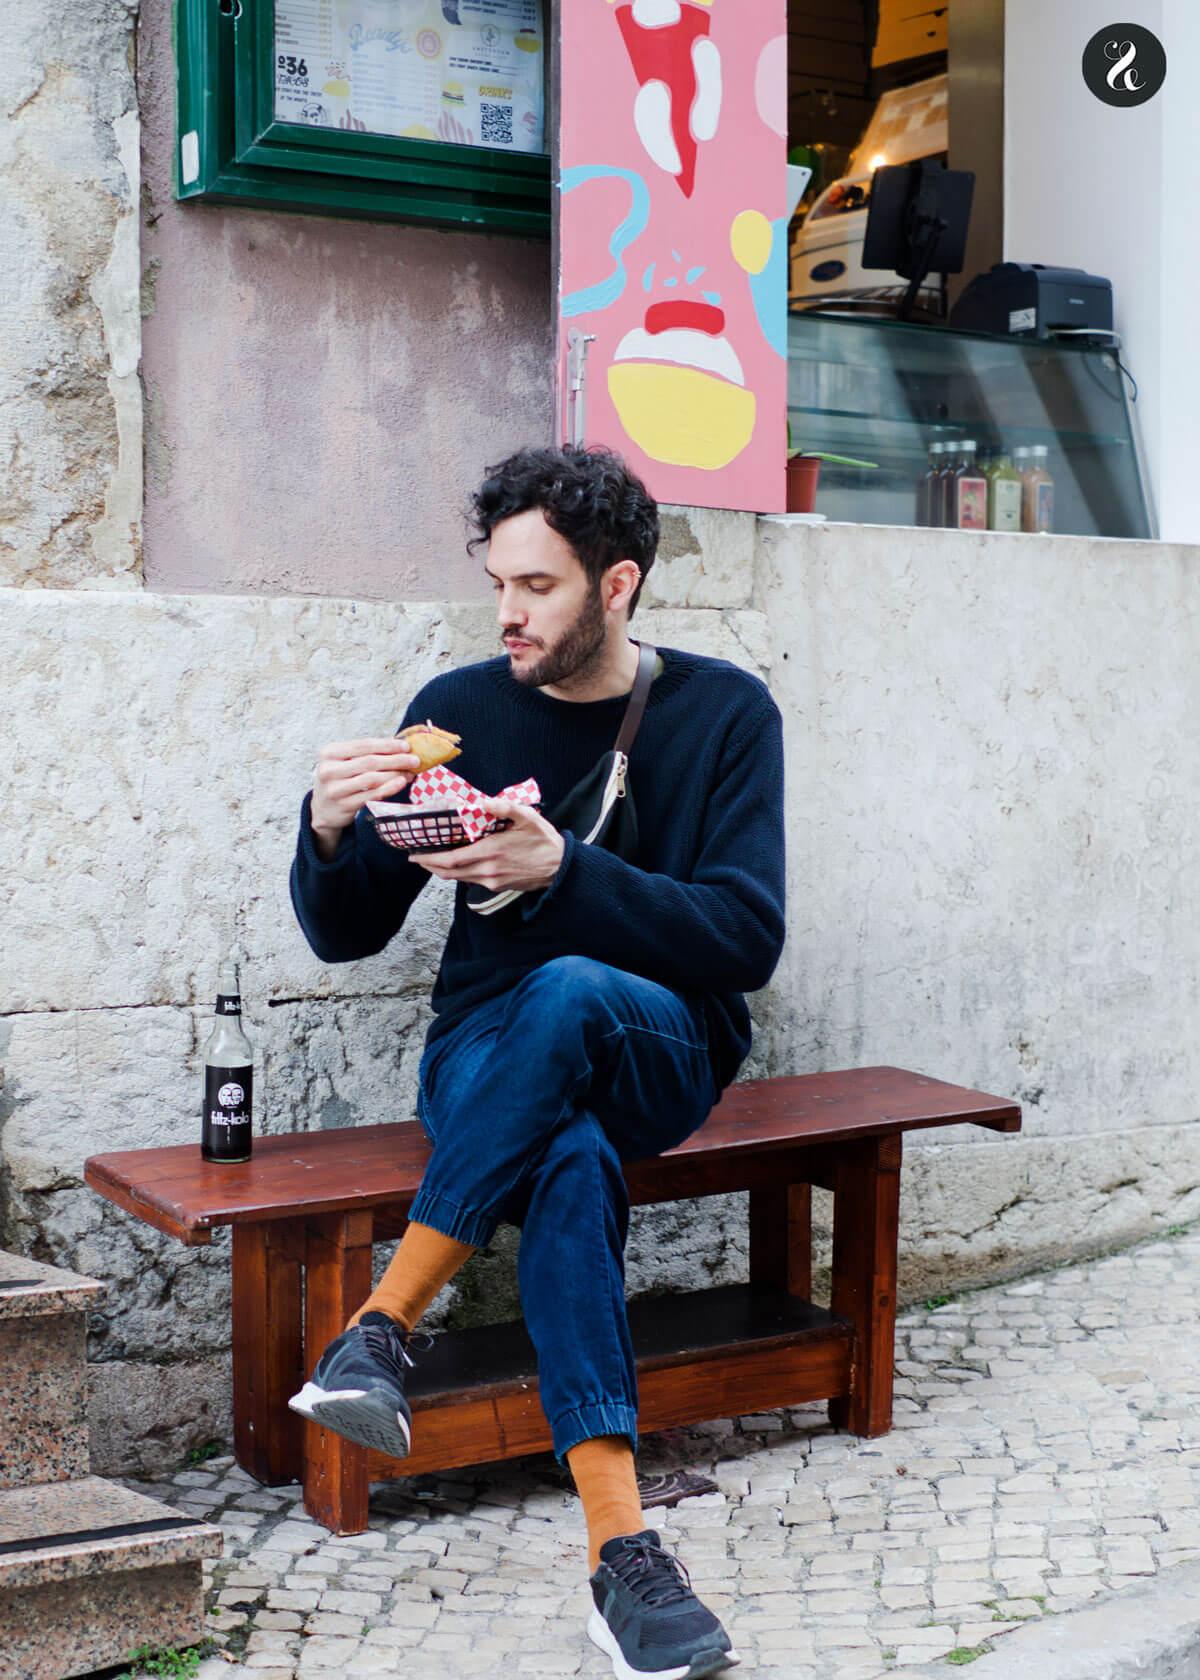 Qué ver en Lisboa - Comer en Lisboa - Plant Base